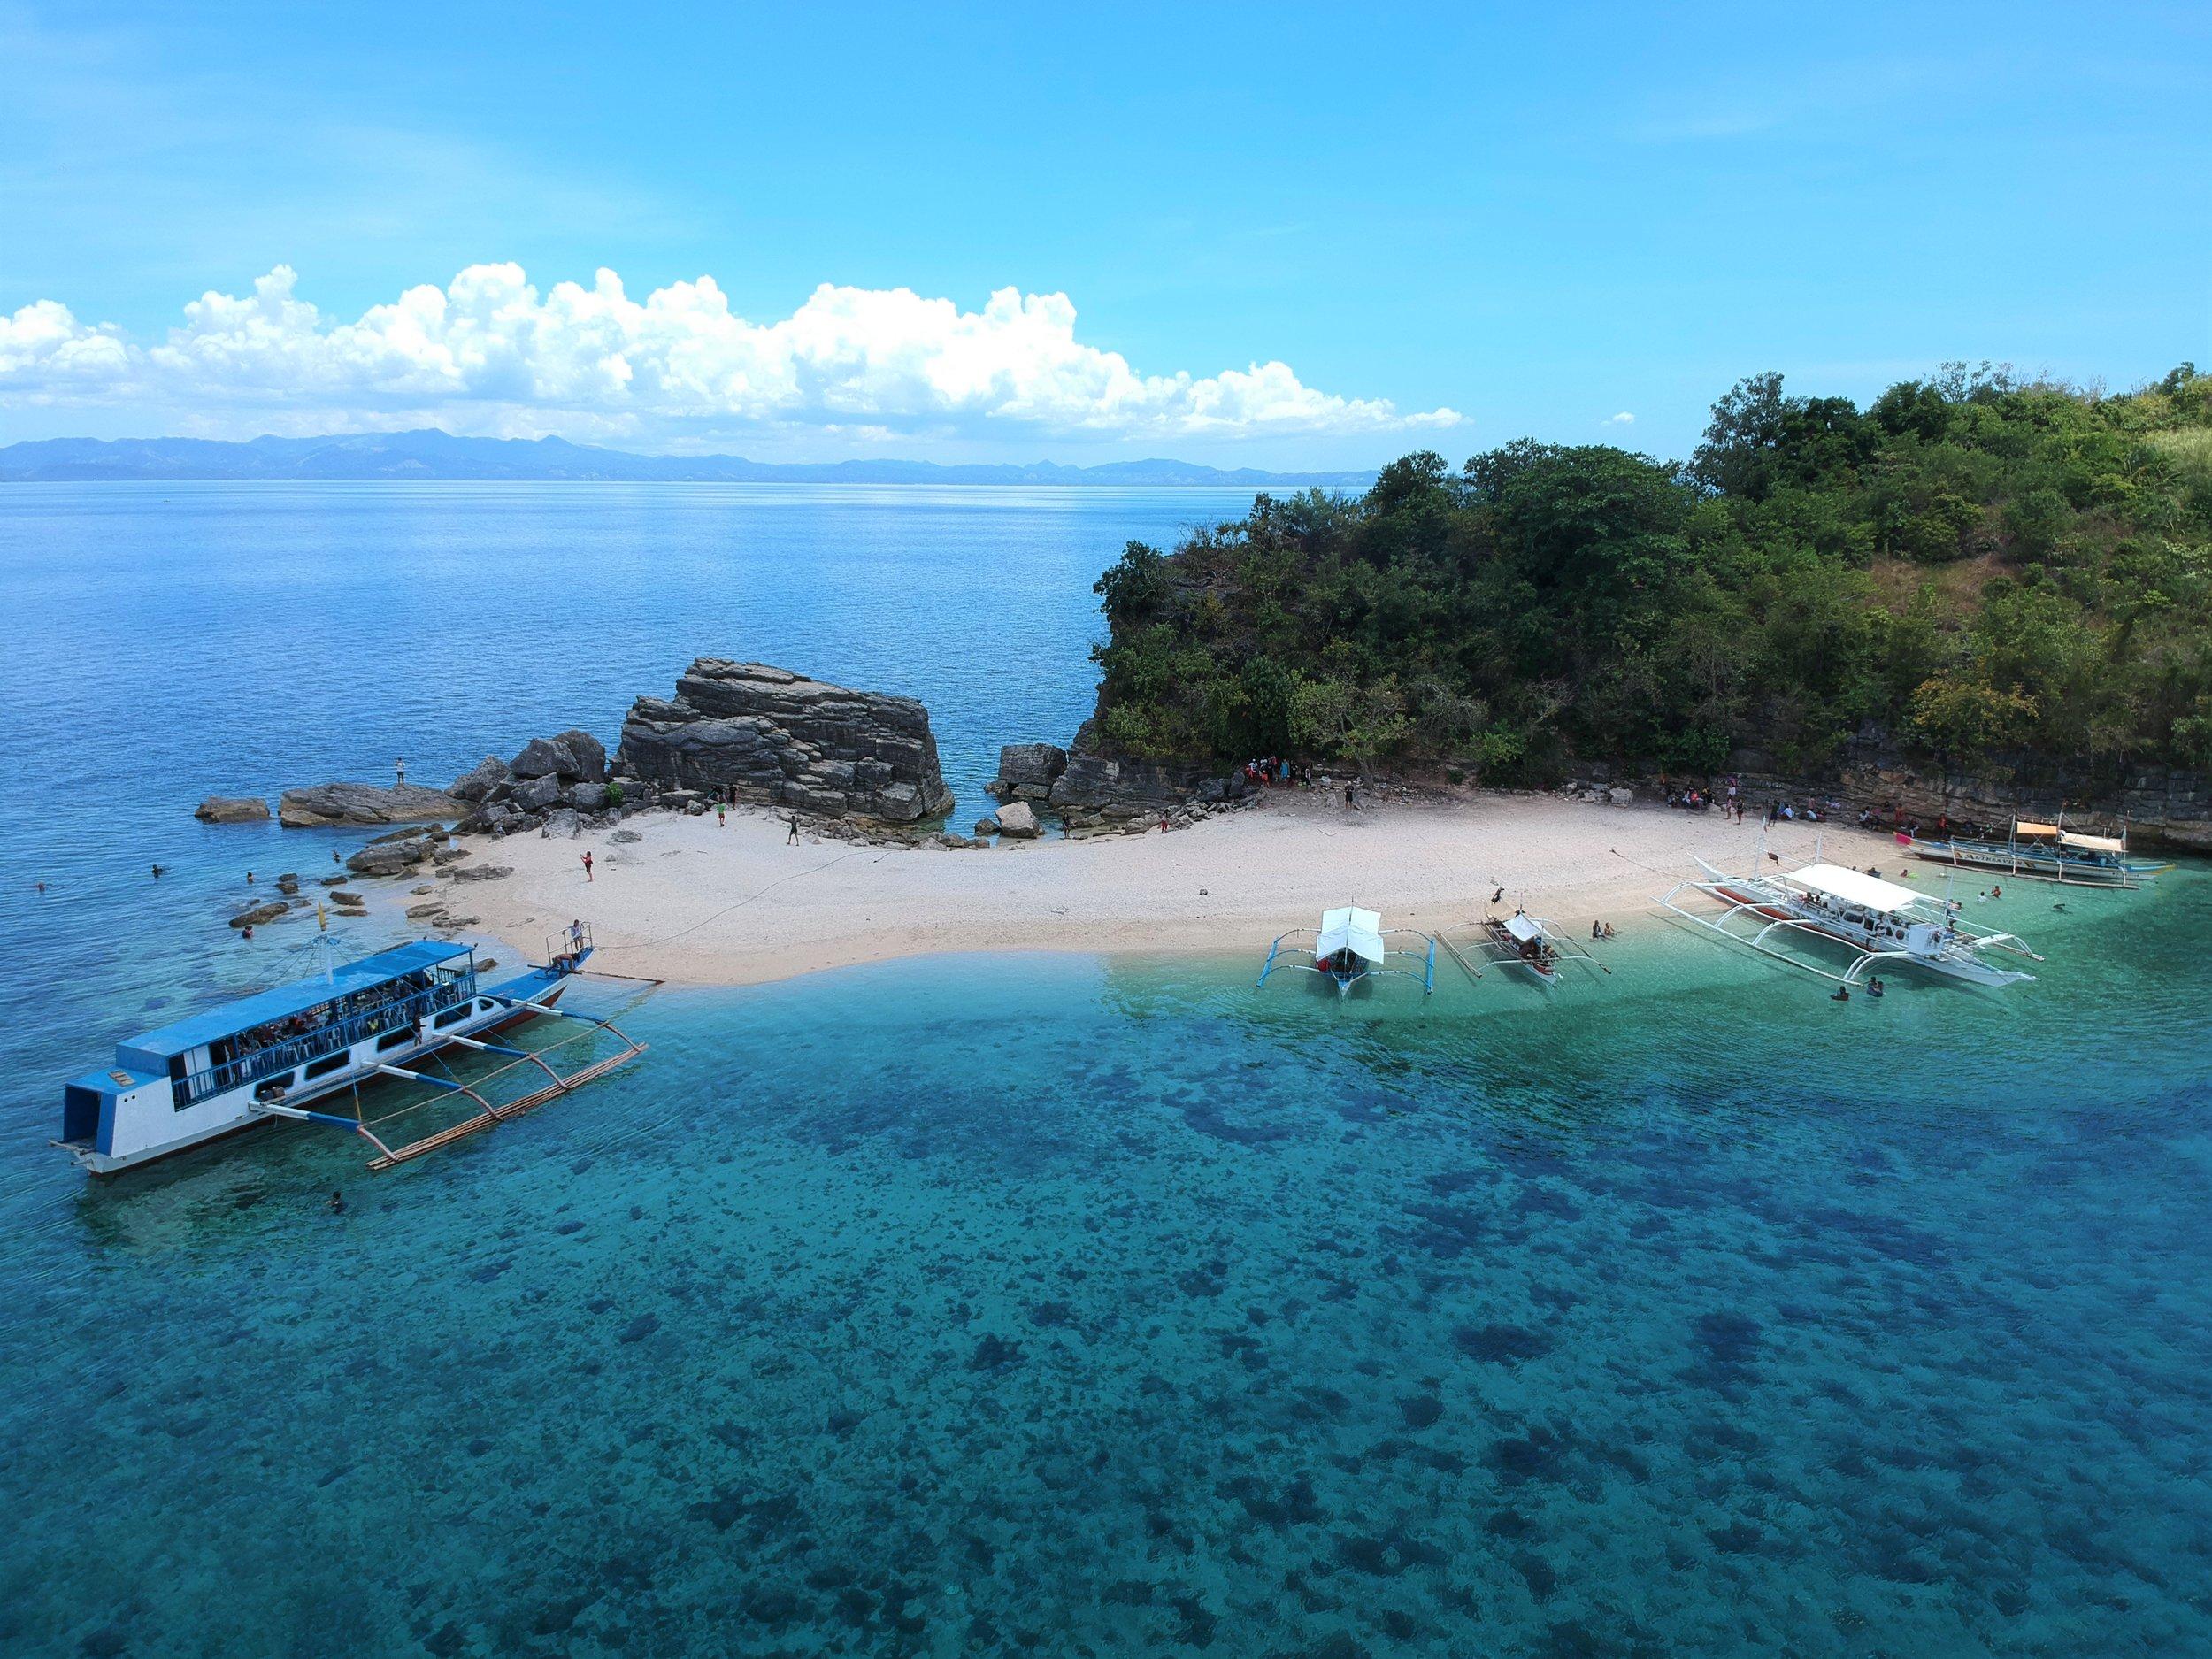 Resting on a remote island